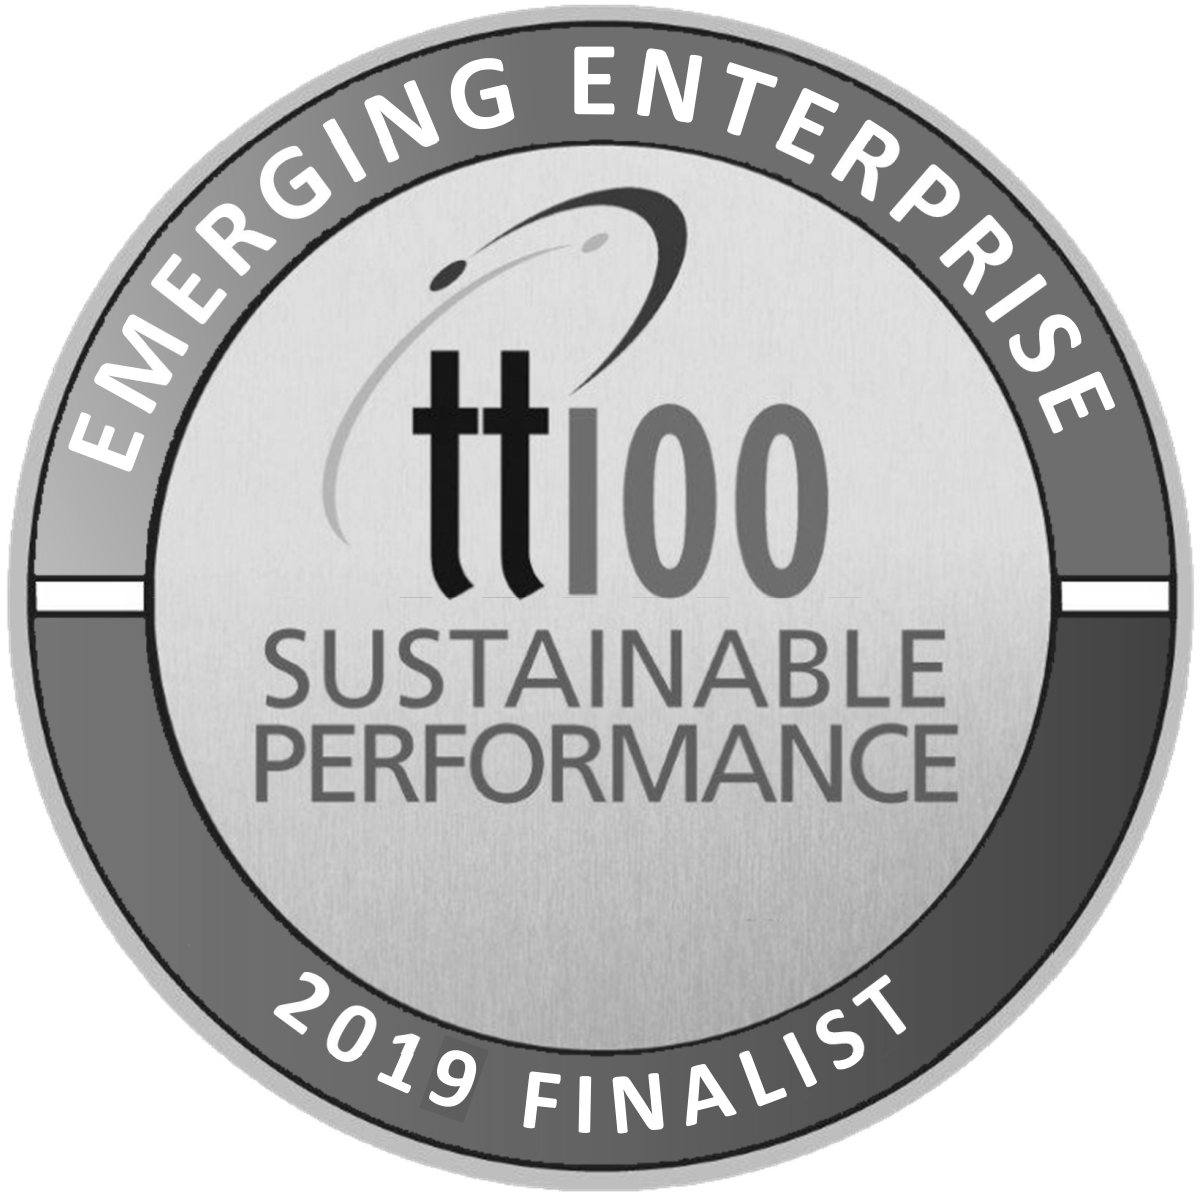 tt100-seal-sustainable-performance-01